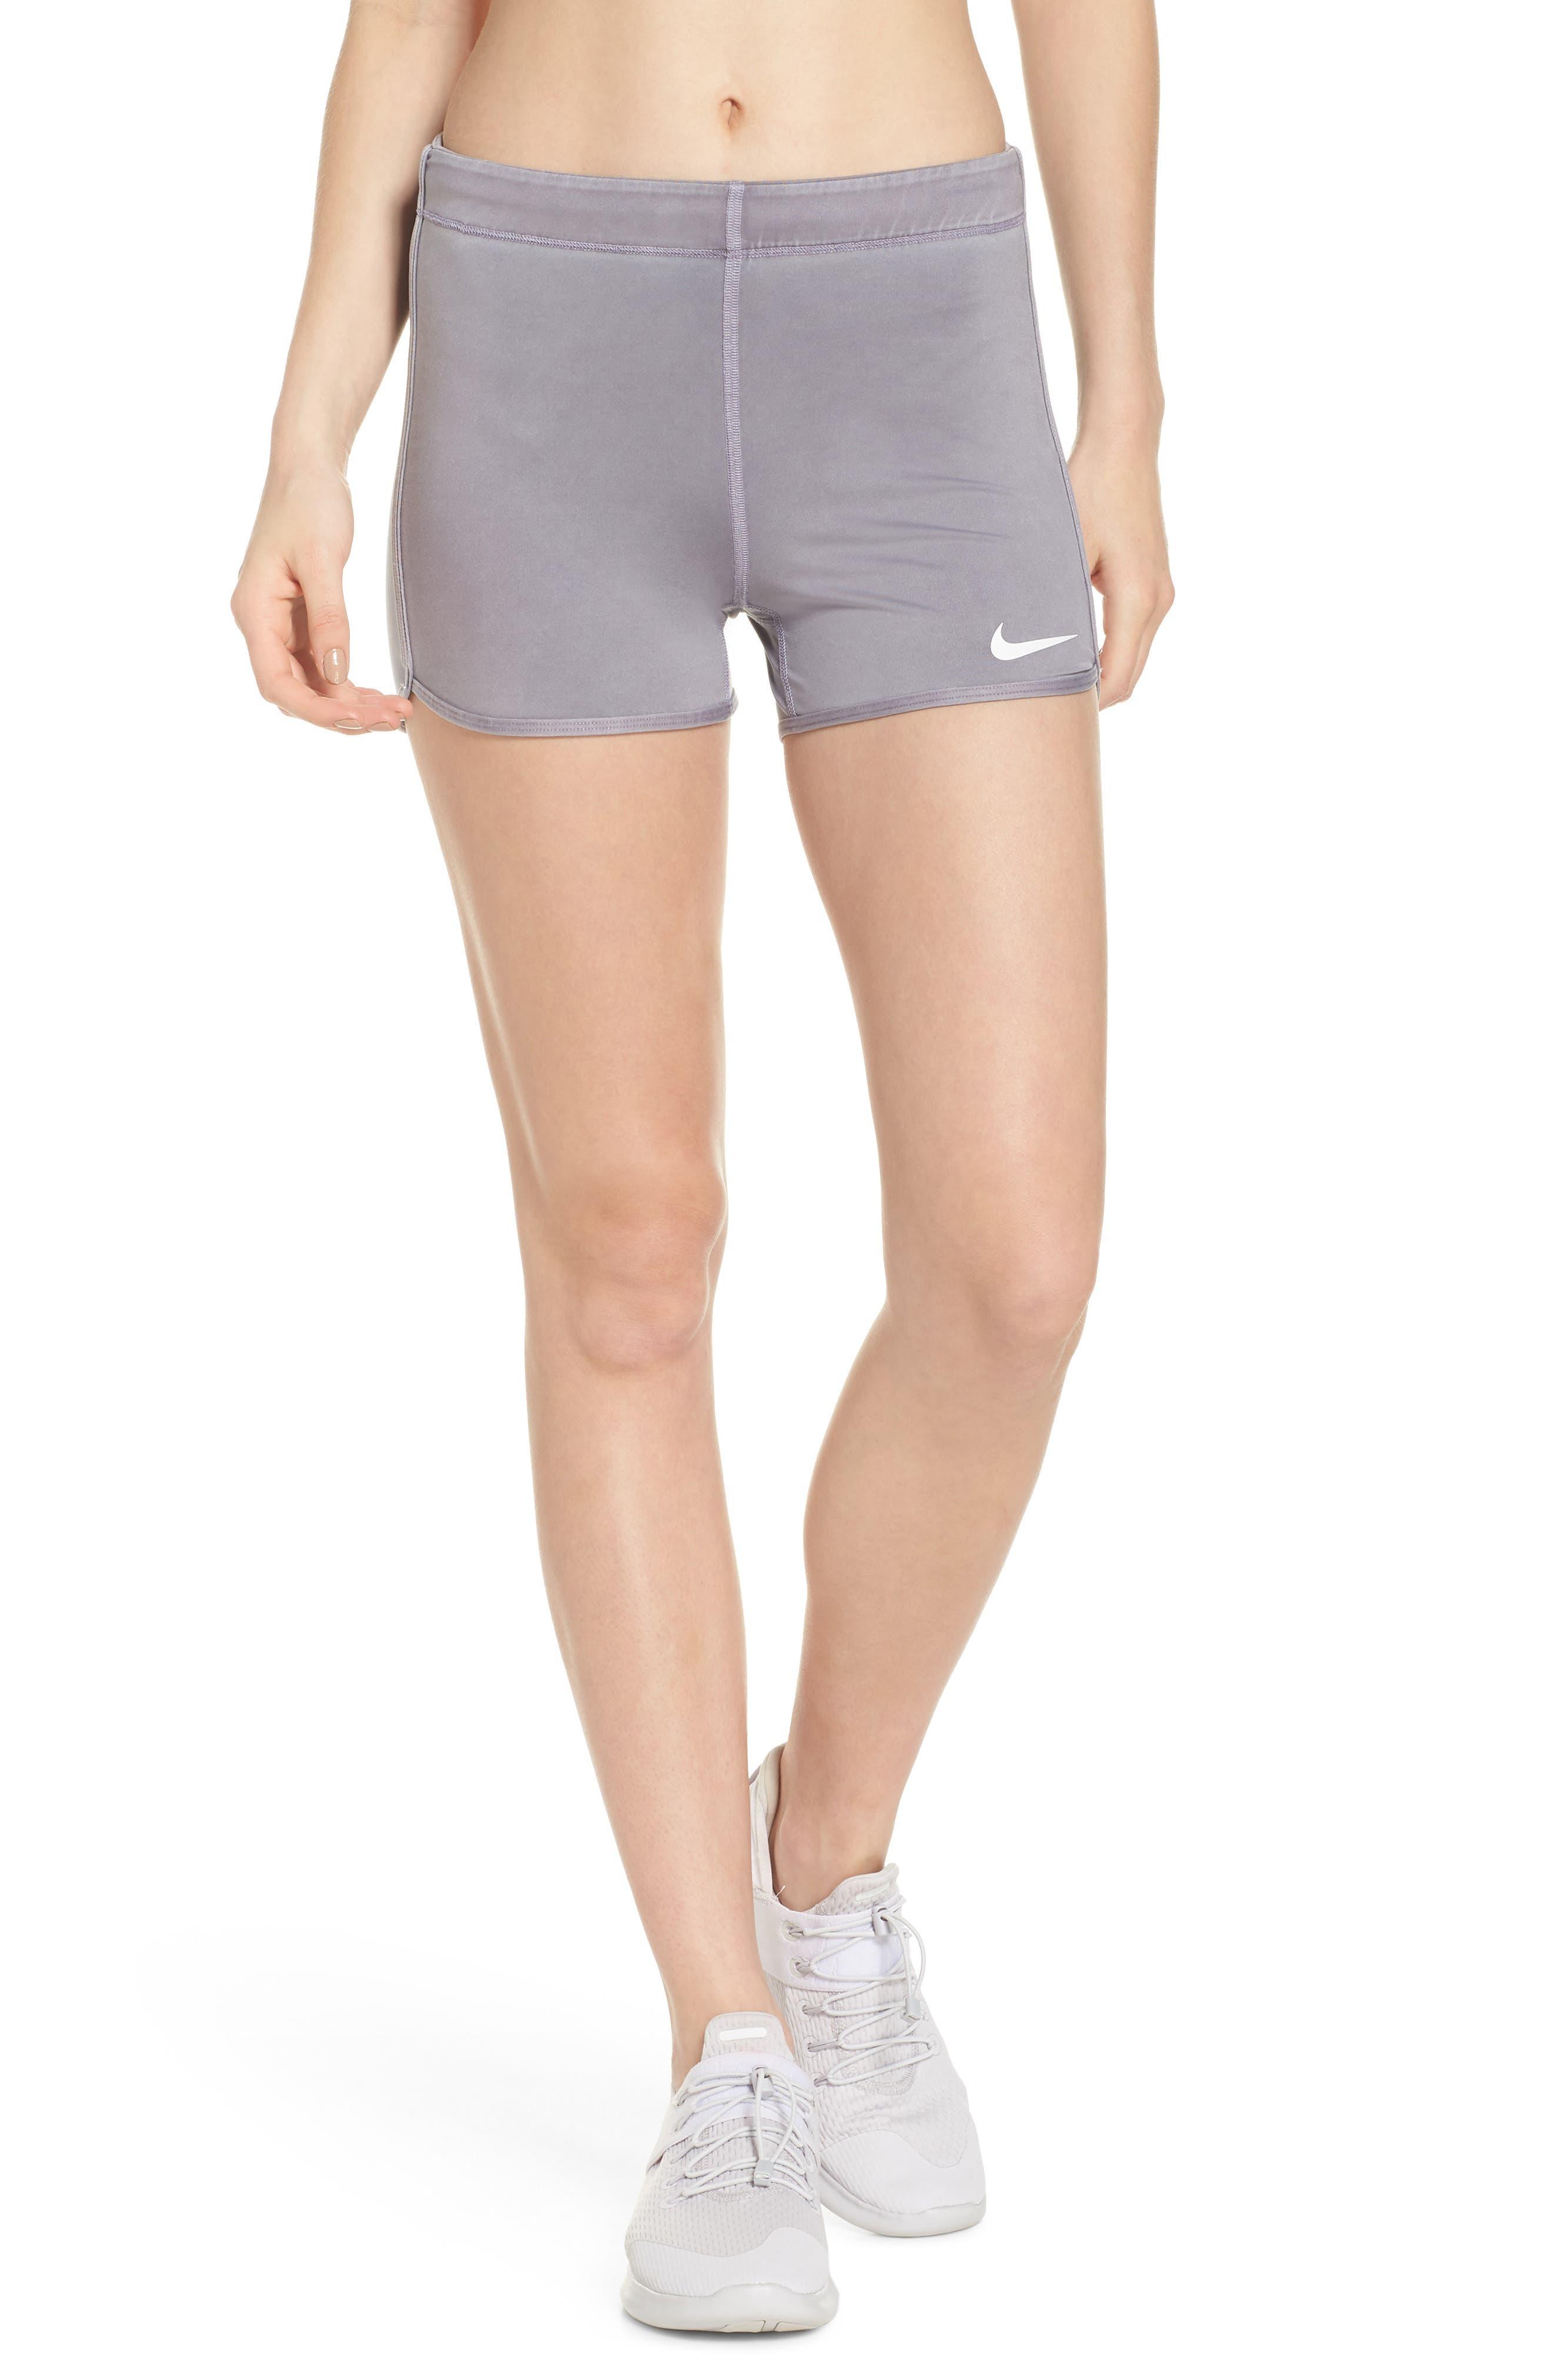 Pro Vintage Shorts,                         Main,                         color, Dark Grey/ White